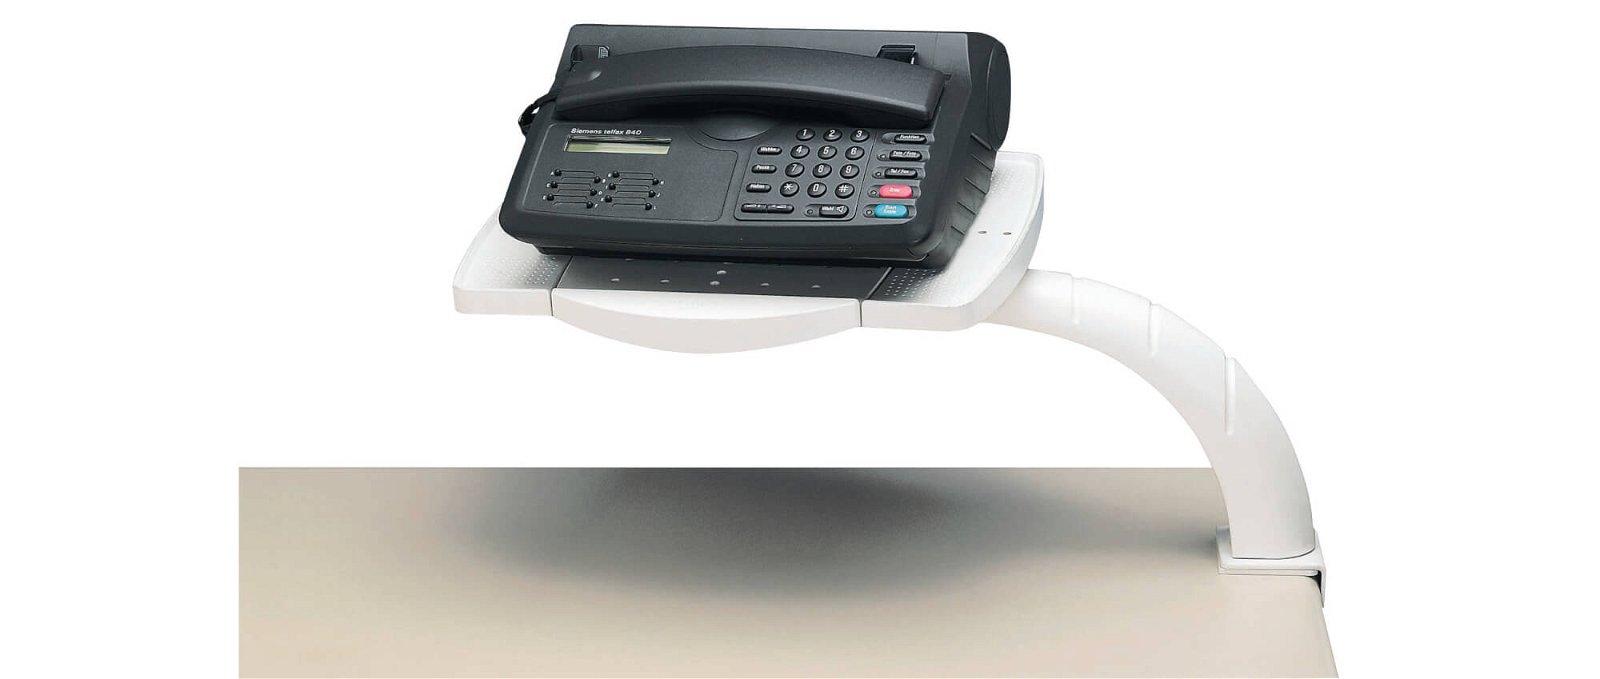 Telefonarm funktional, mit Multifunktions-Platte, grau